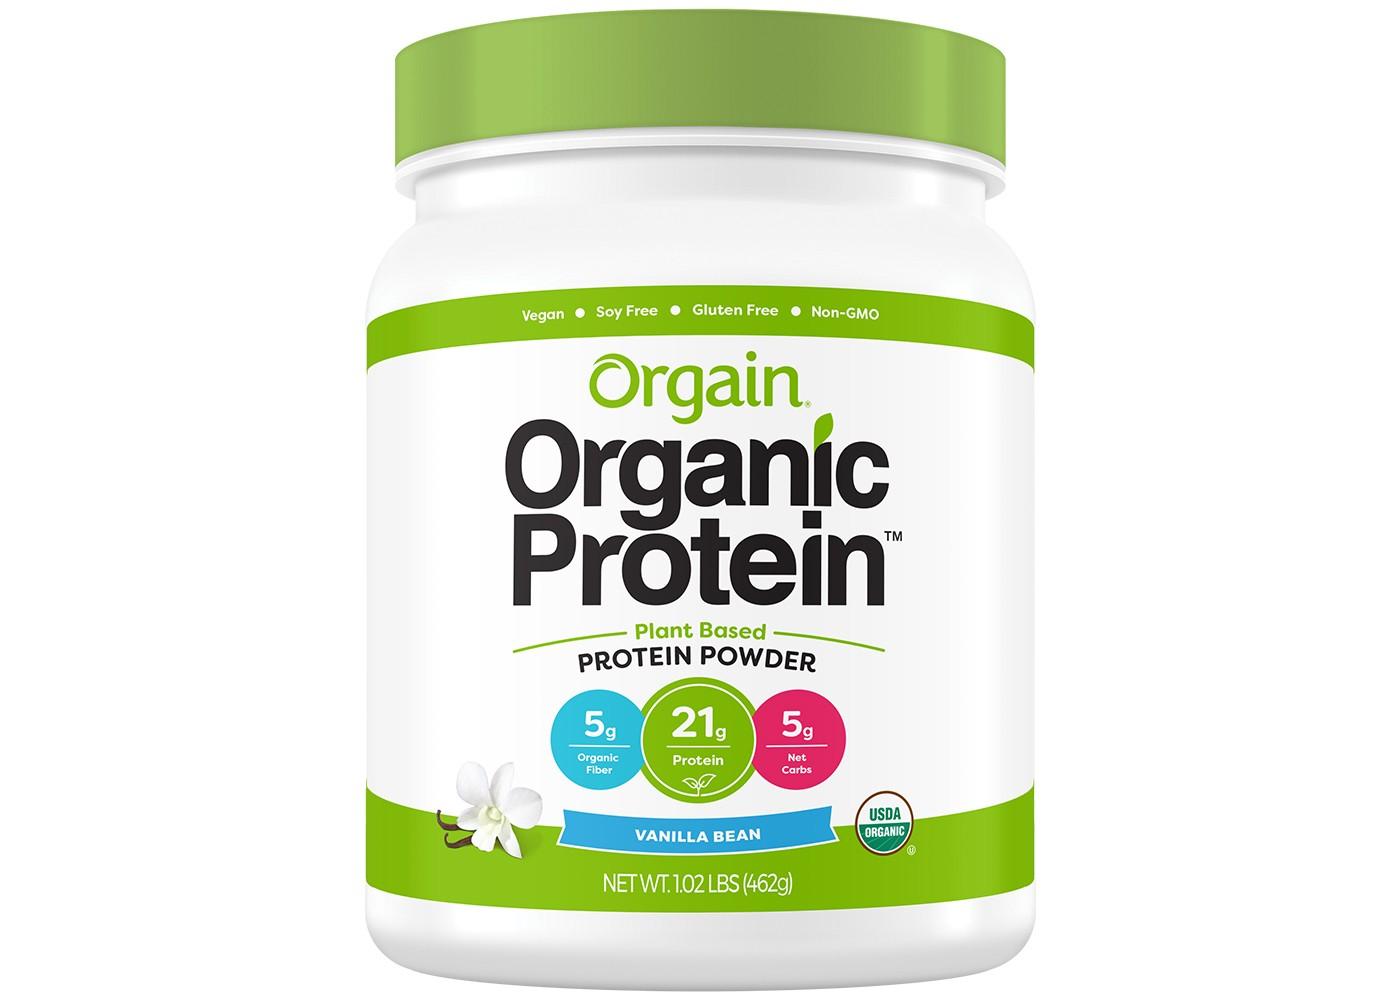 Orgain Organic Plant-Based Protein Powder - Vanilla Bean - 16.32oz